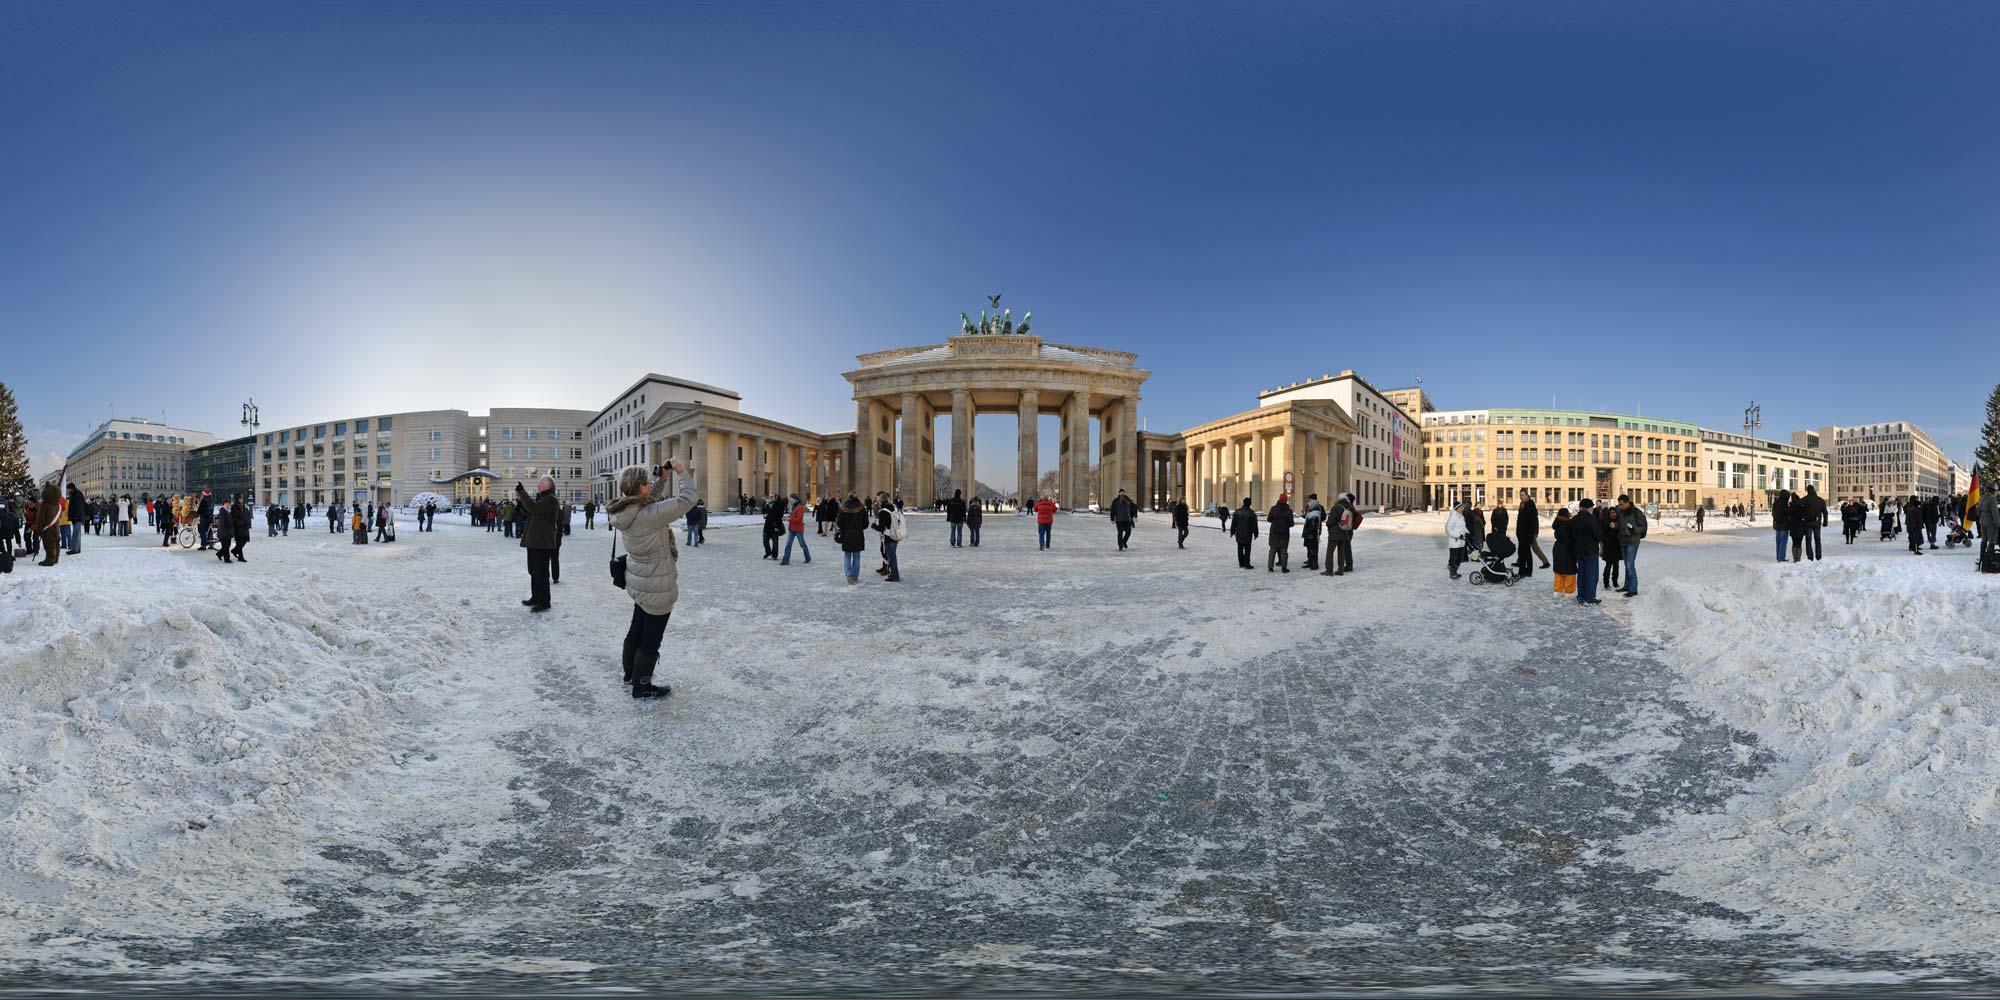 берлин зимой картинки этих двух